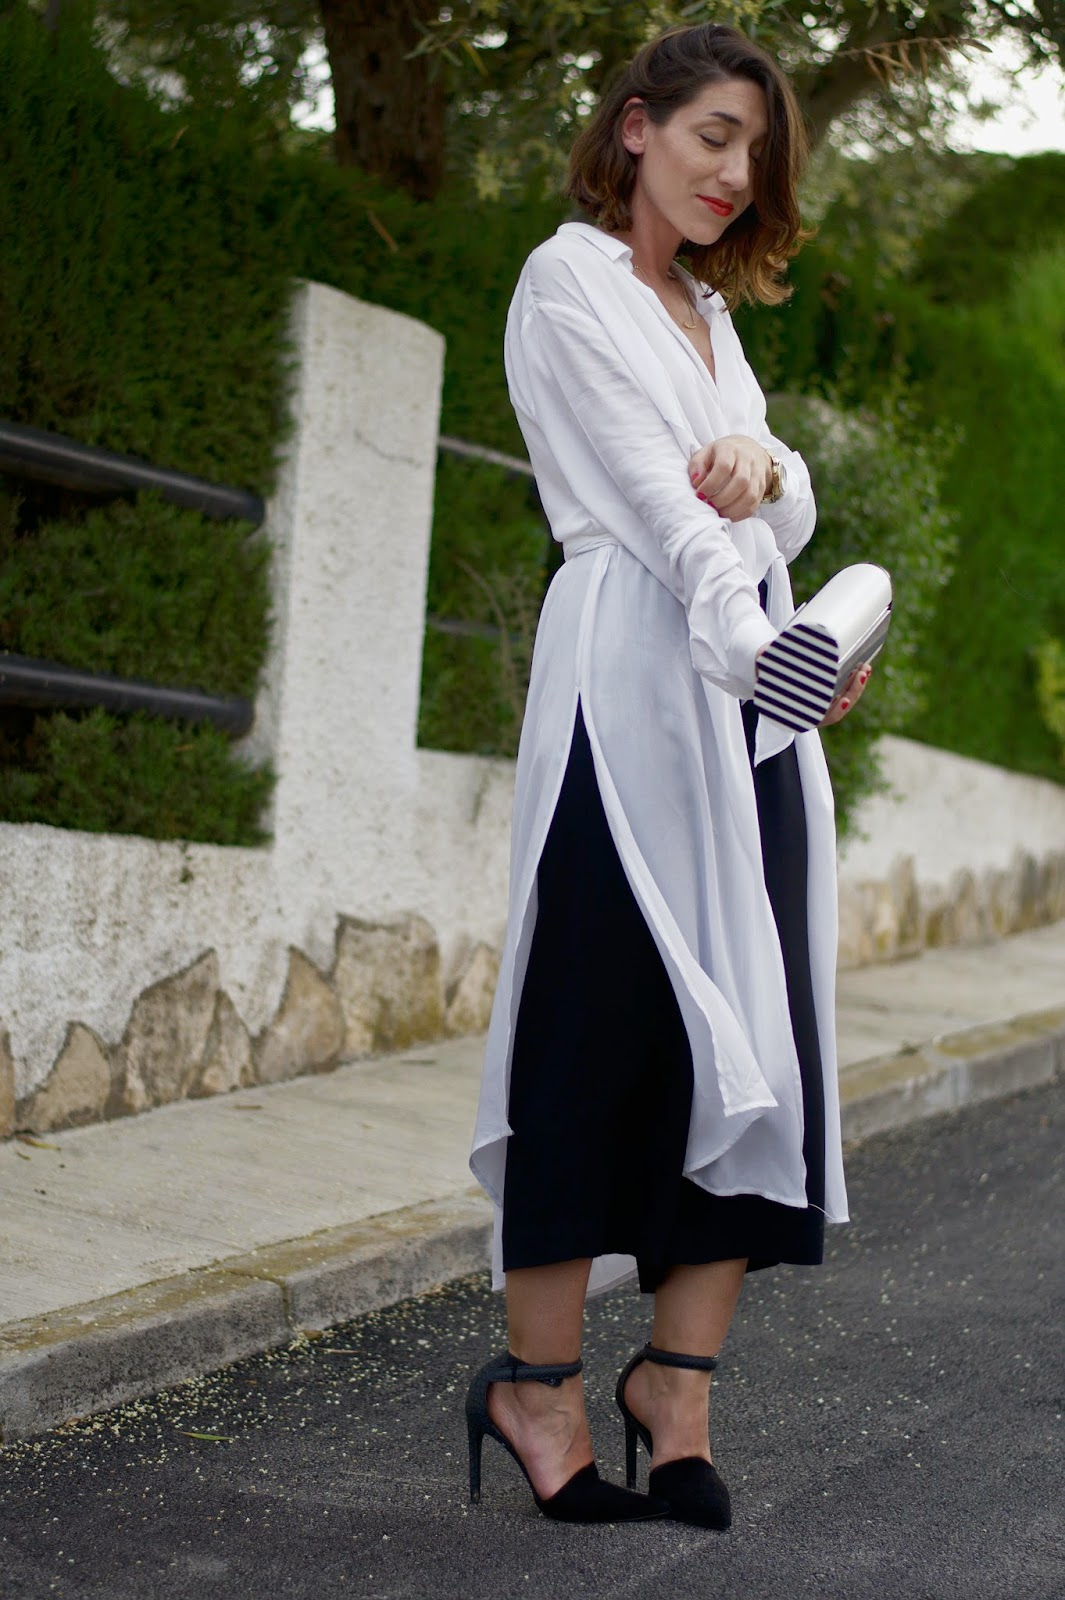 Pantalones y Camisa H&M, tacones Mango, Clutch Marc Jacobs